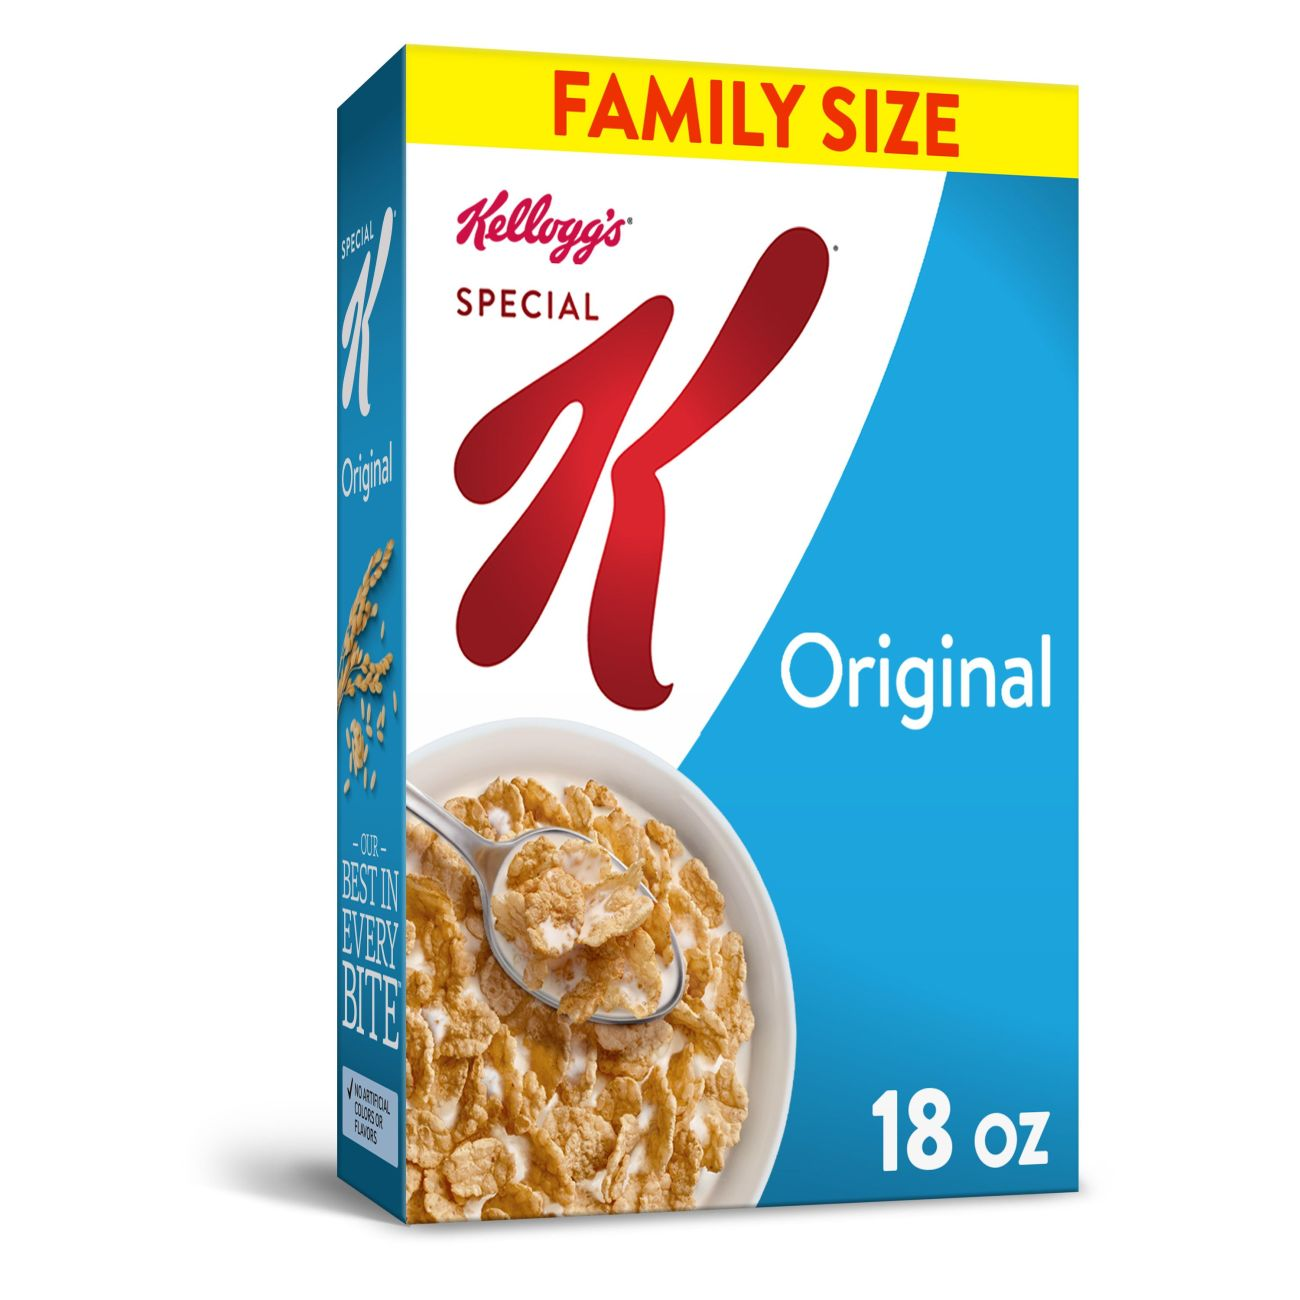 Kellogg's Special K Breakfast Cereal Value Size 18 Oz